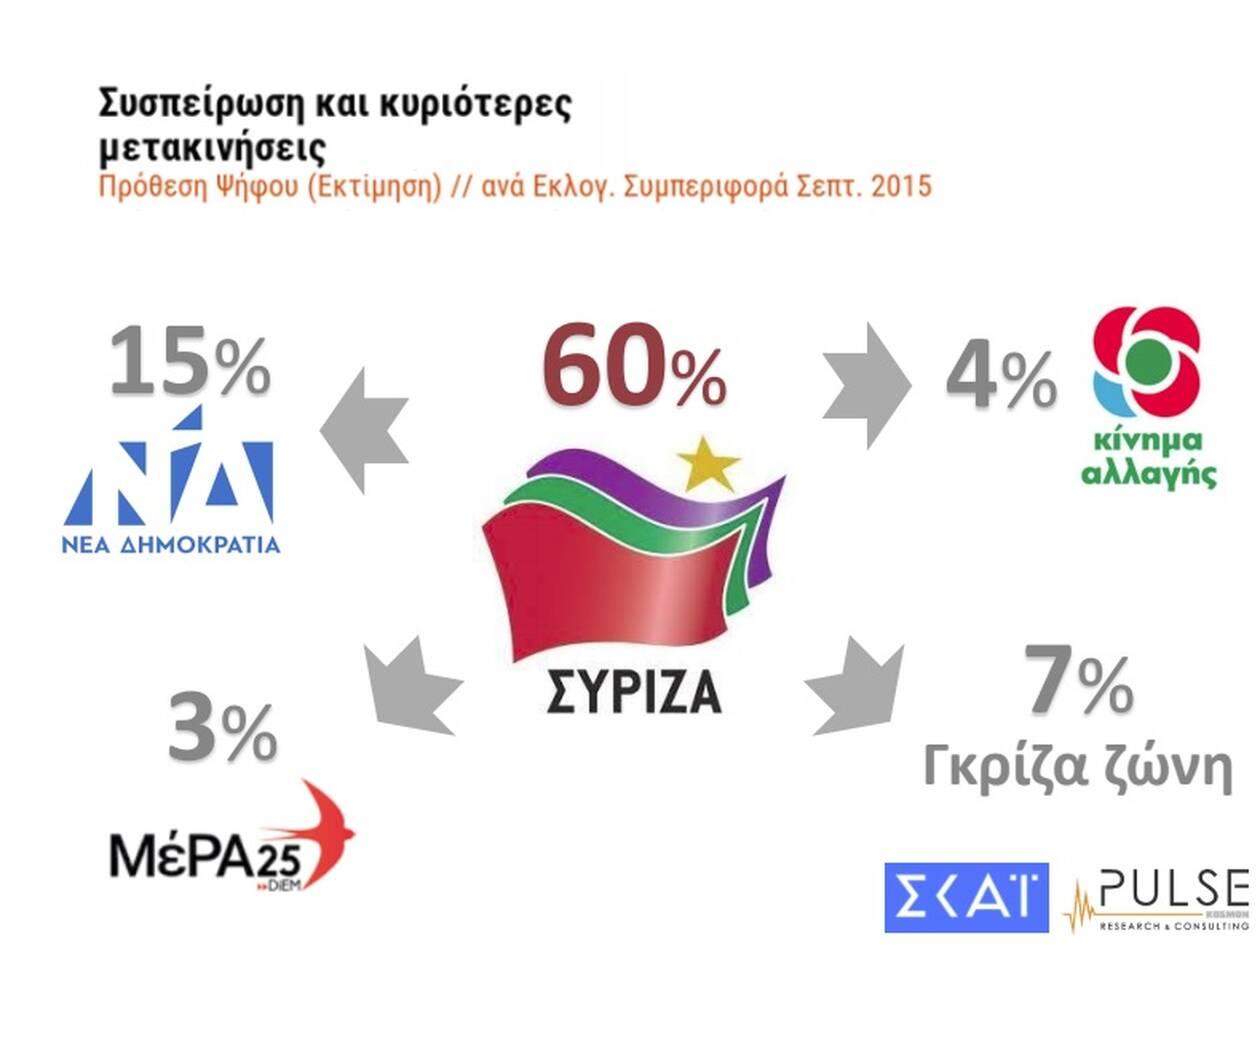 poll23520194.jpg